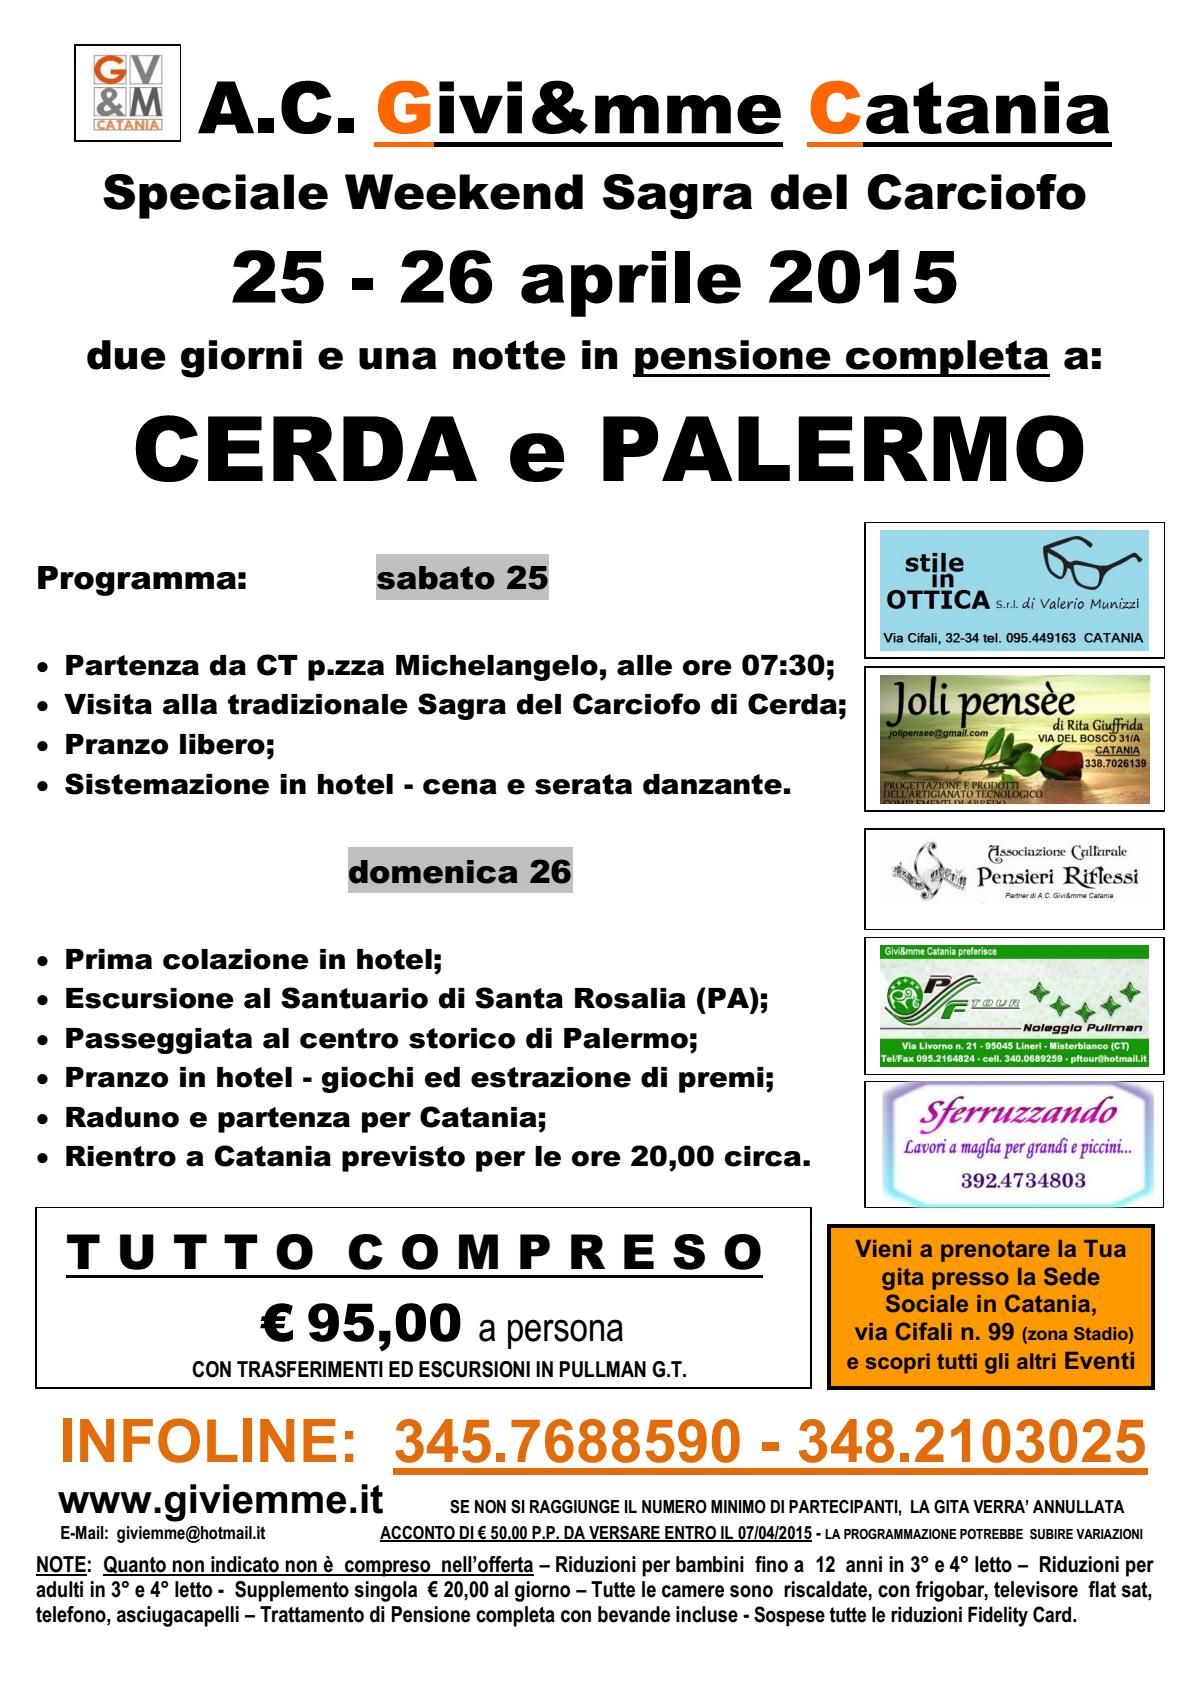 Locandina Ponte 25 aprile 2015 con partner